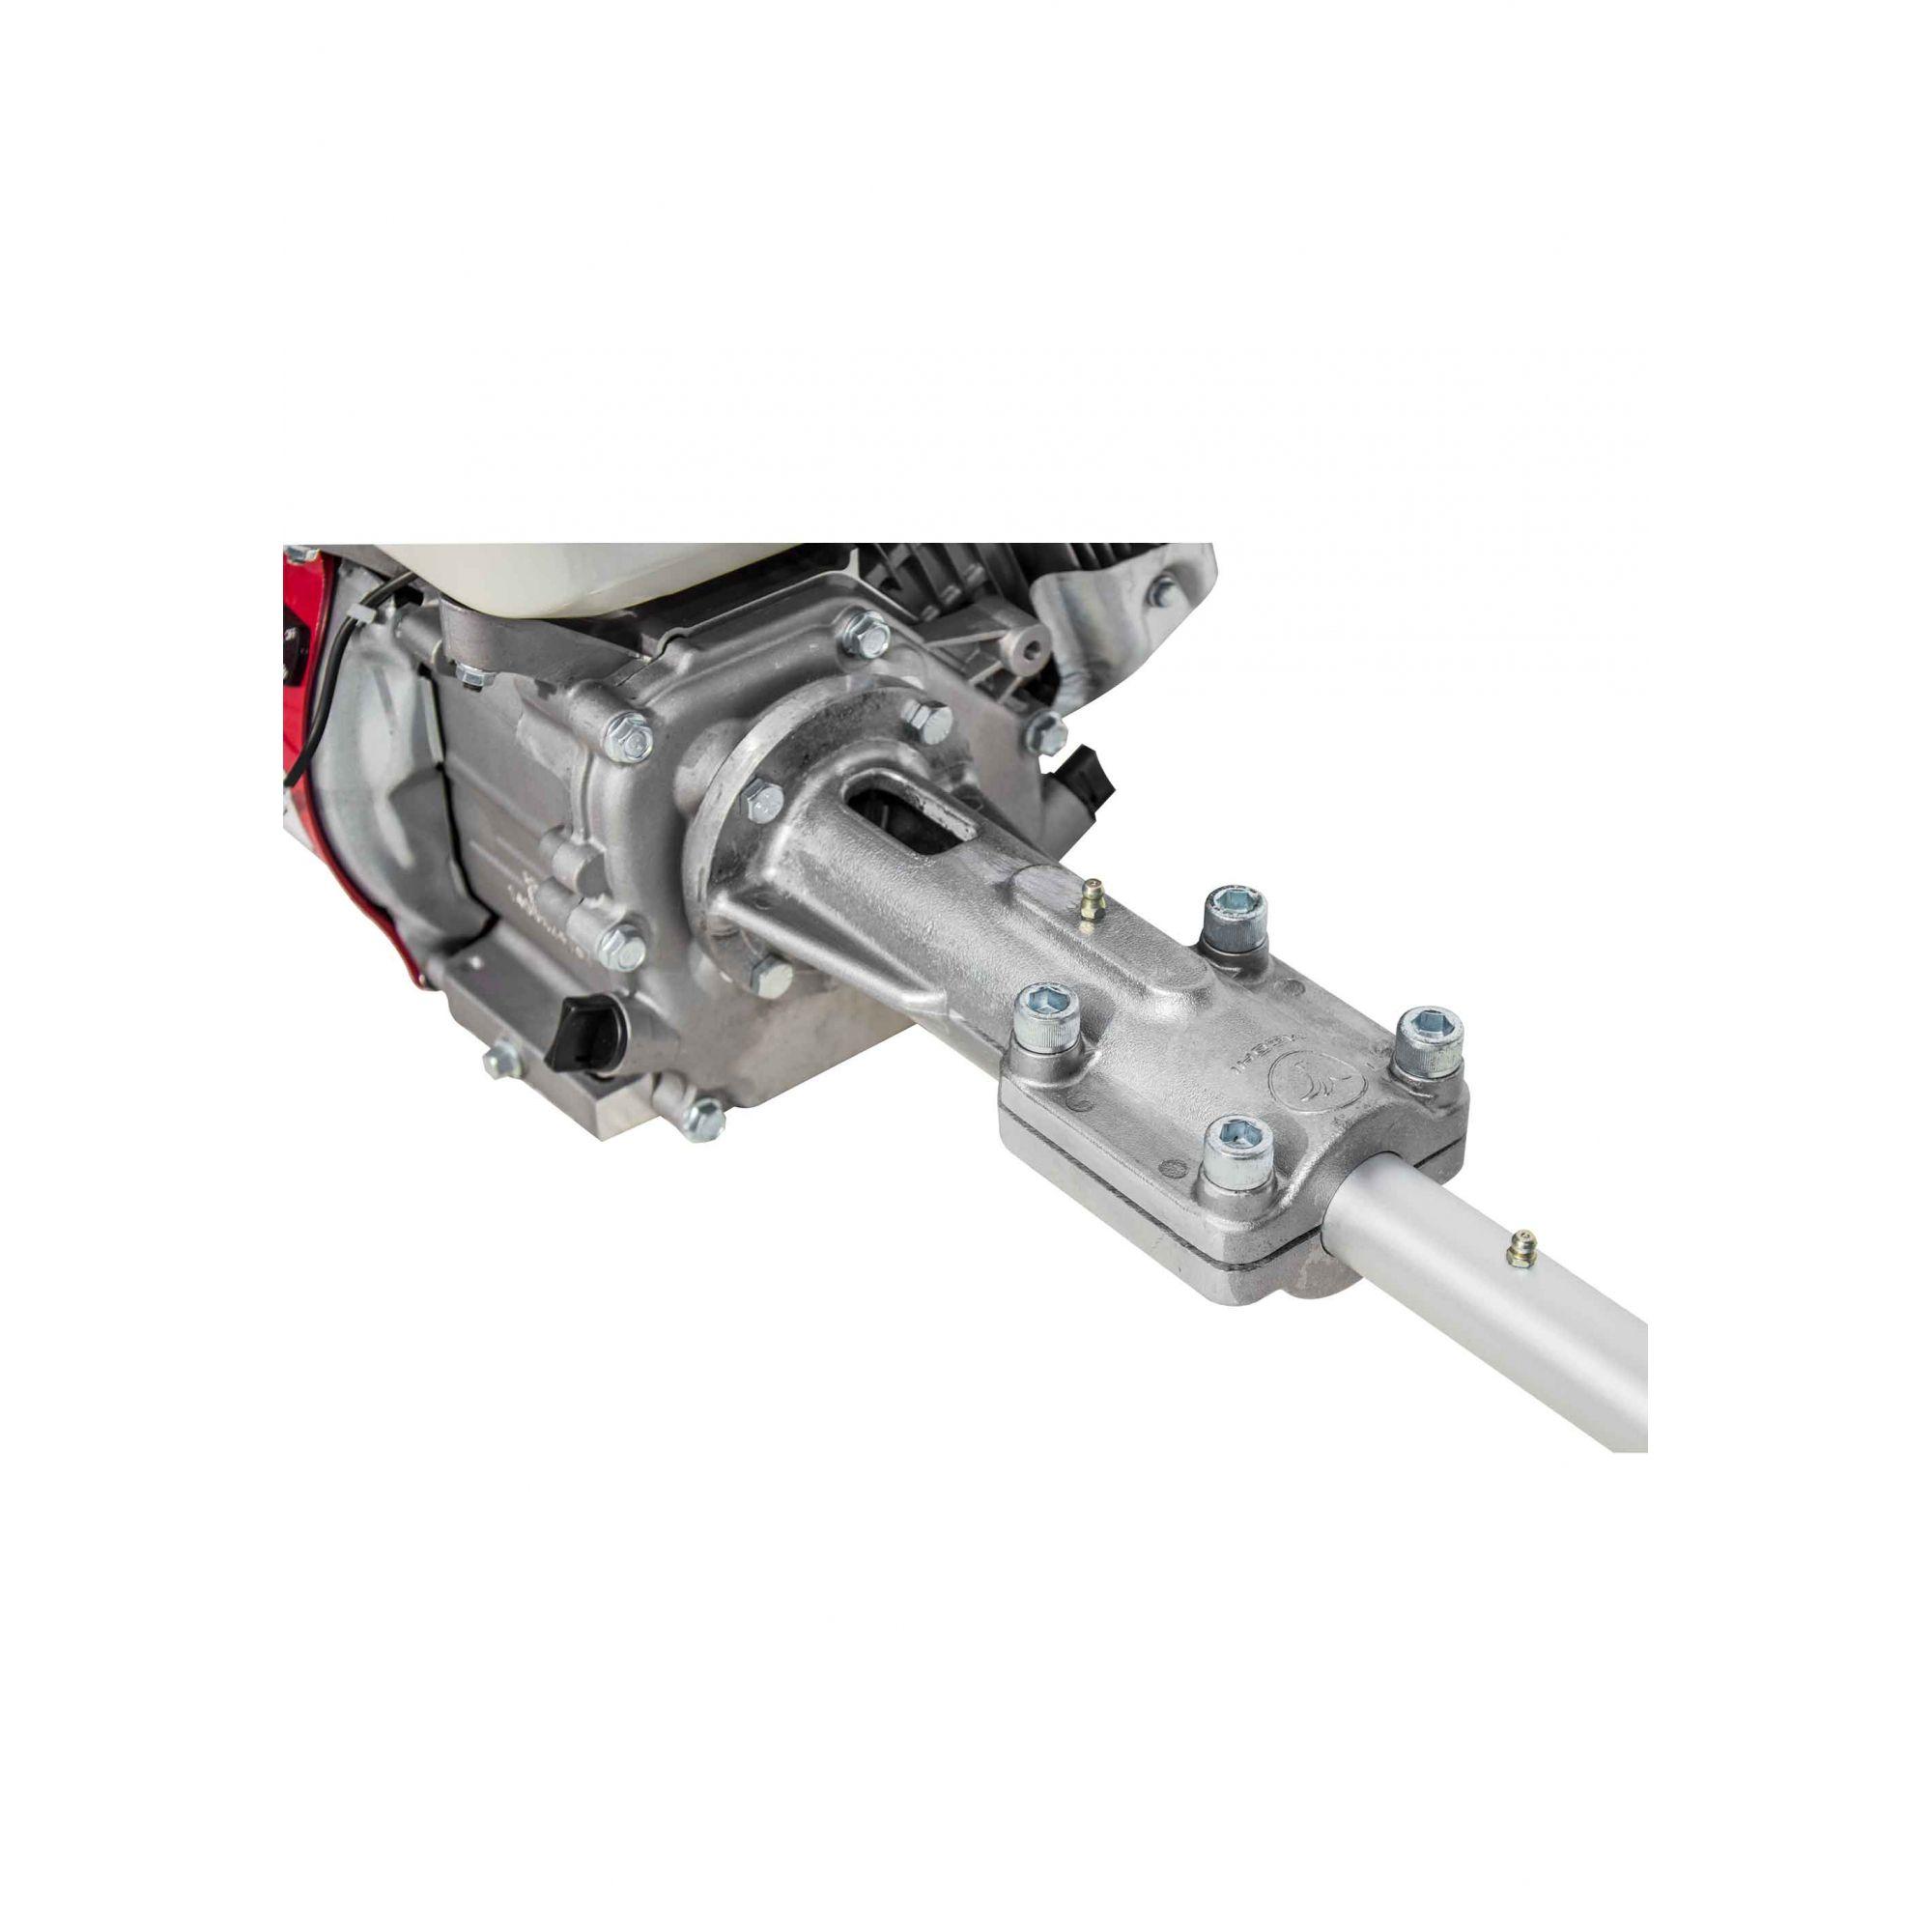 Kit Motor De Centro Barco Bote 1,70mt Motor 7 Die 08/09 Gaso